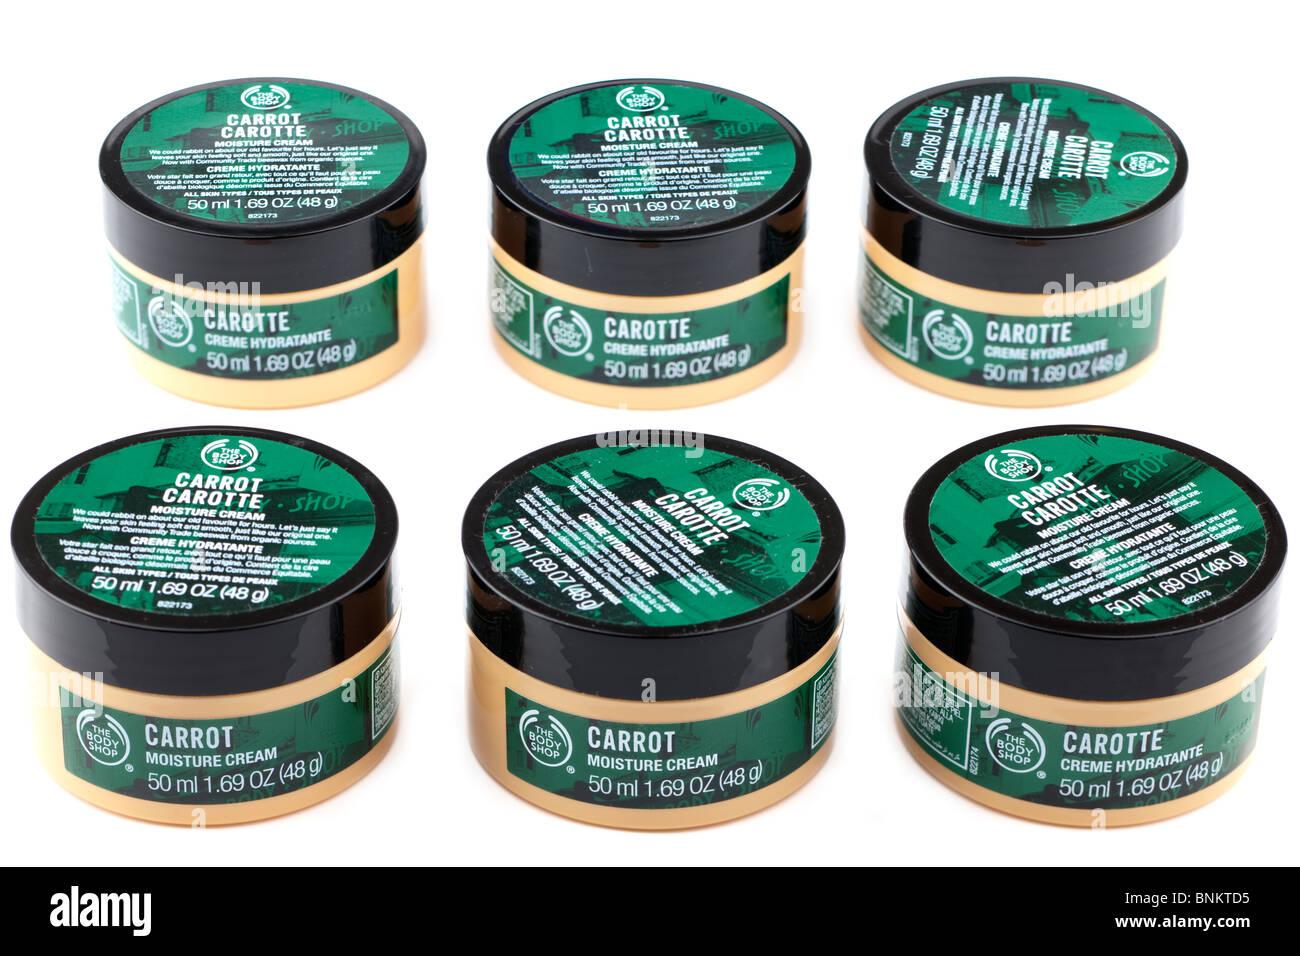 Six tubs of Carrot moisture cream creme hydratante - Stock Image